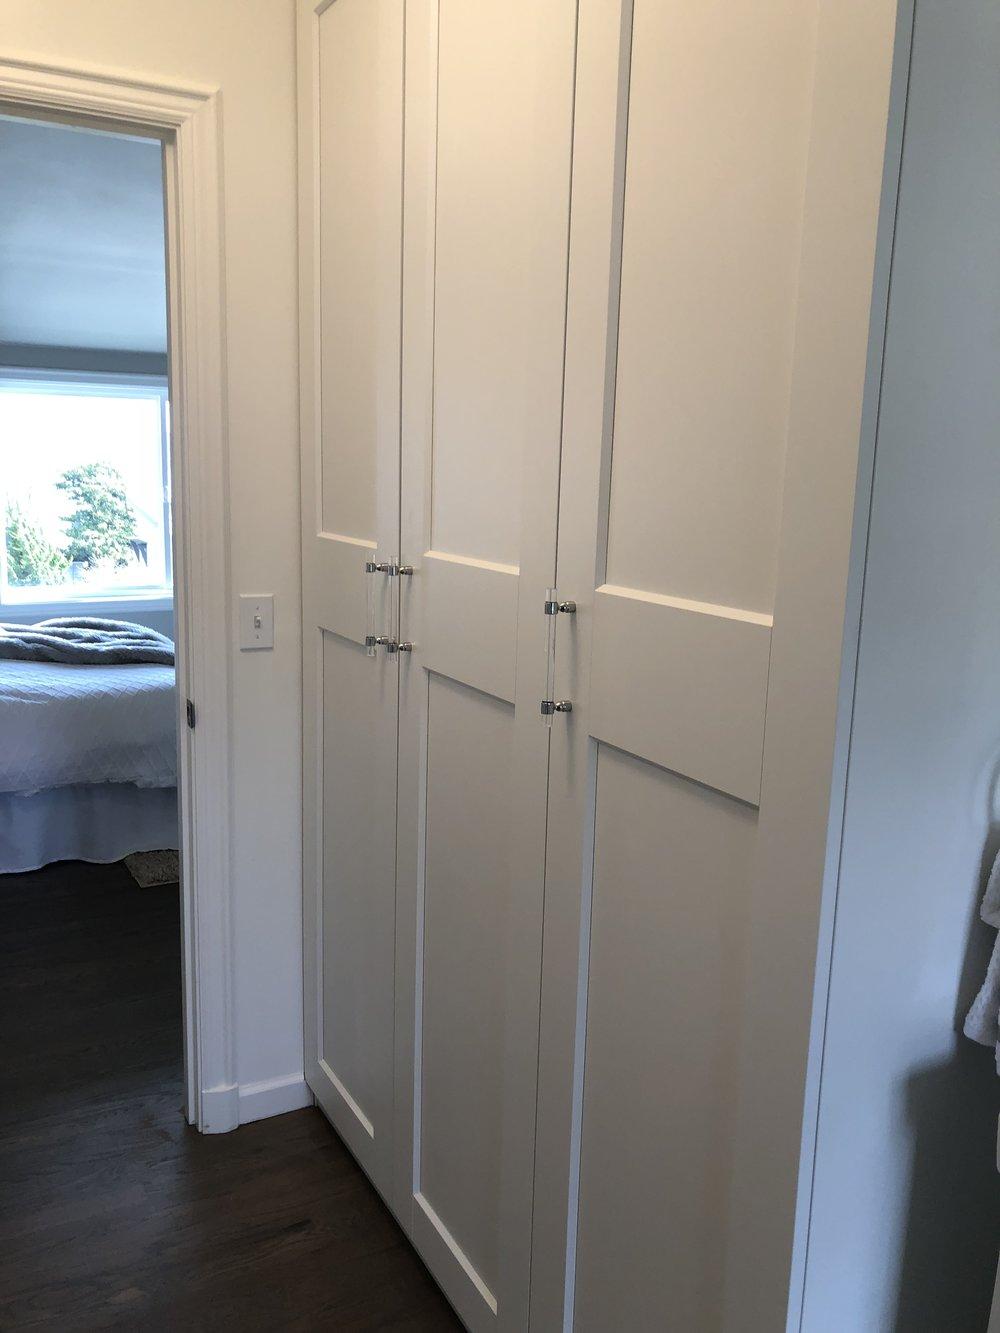 Who wouldn't love a closet in their master bath? So convenient!